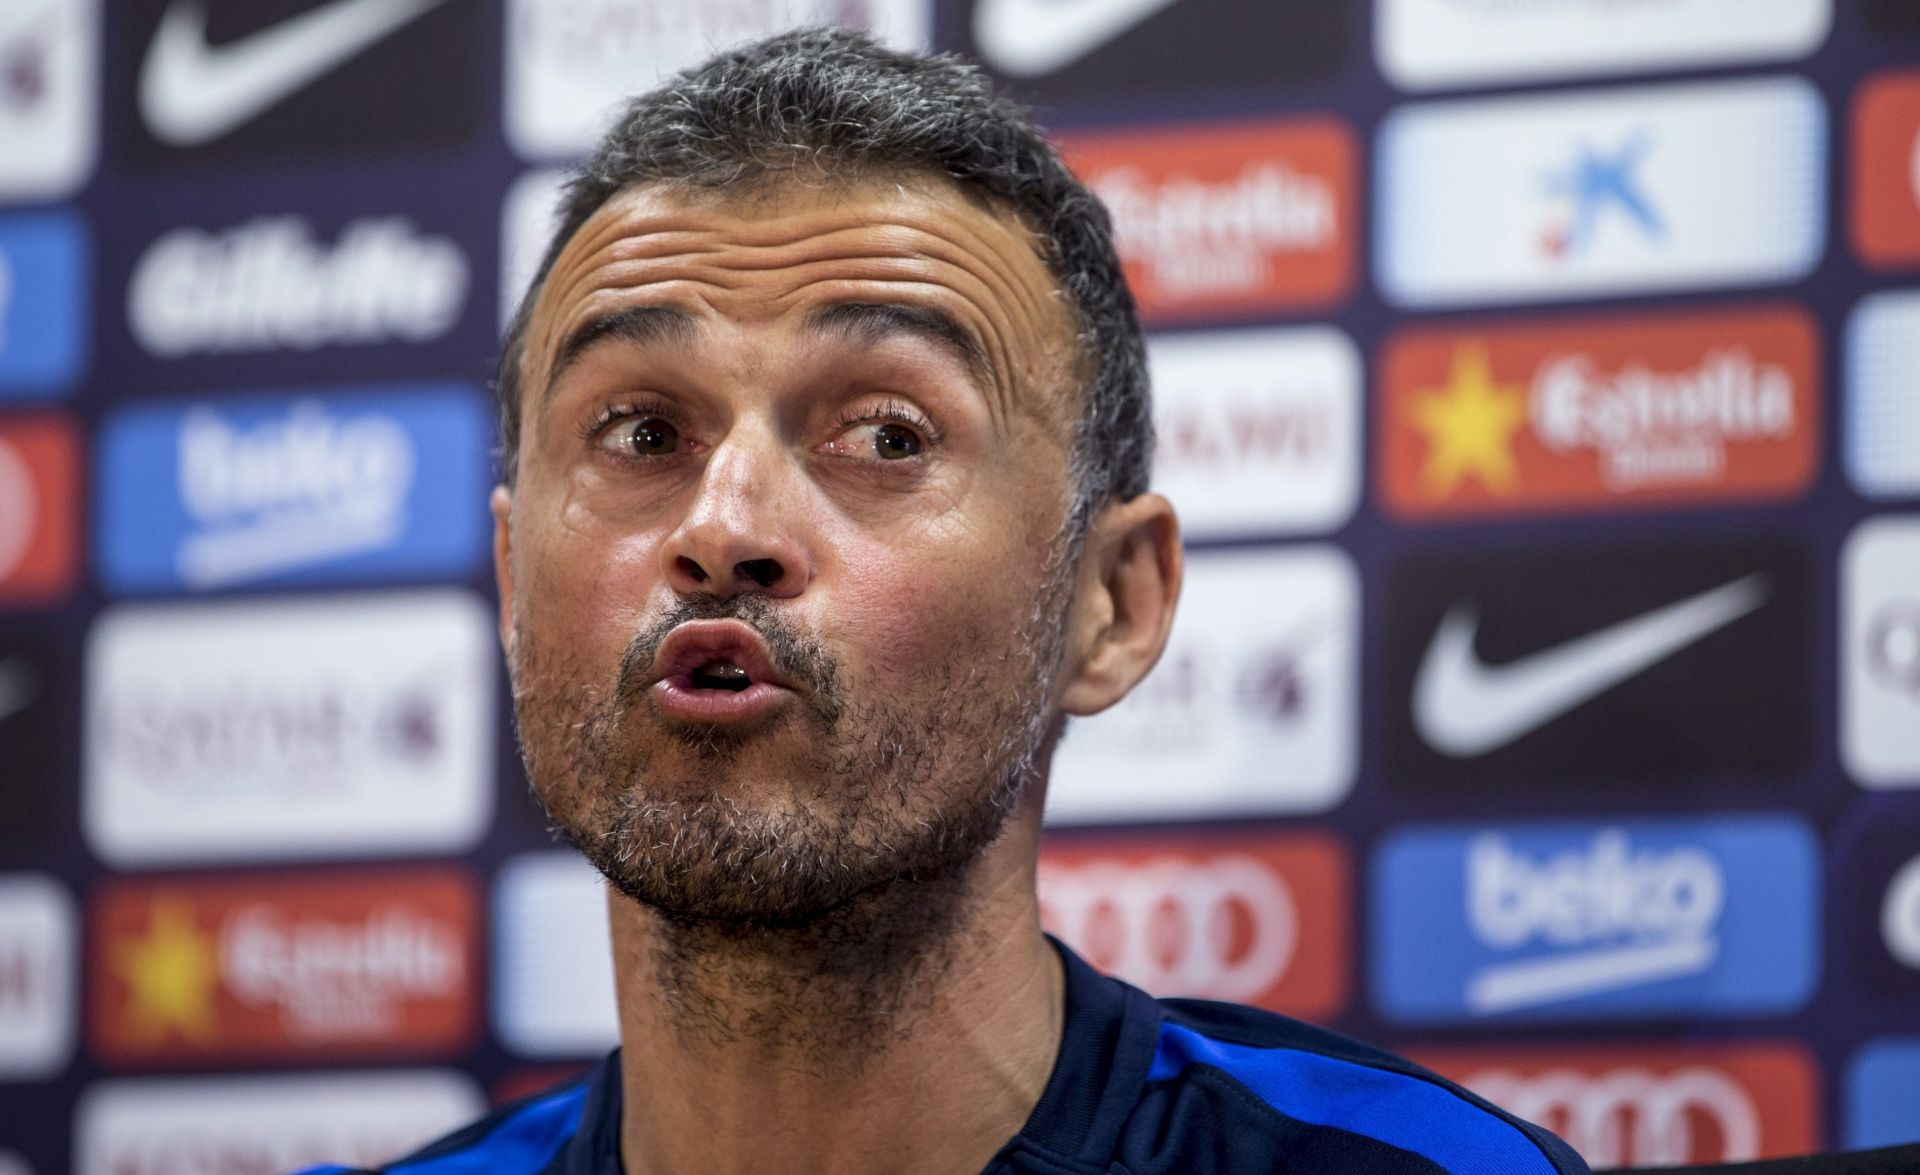 "LUIS ENRIQUE NAKON REMIJA ""Bila je ovo daleko najgora utakmica otkako sam ja trener"""